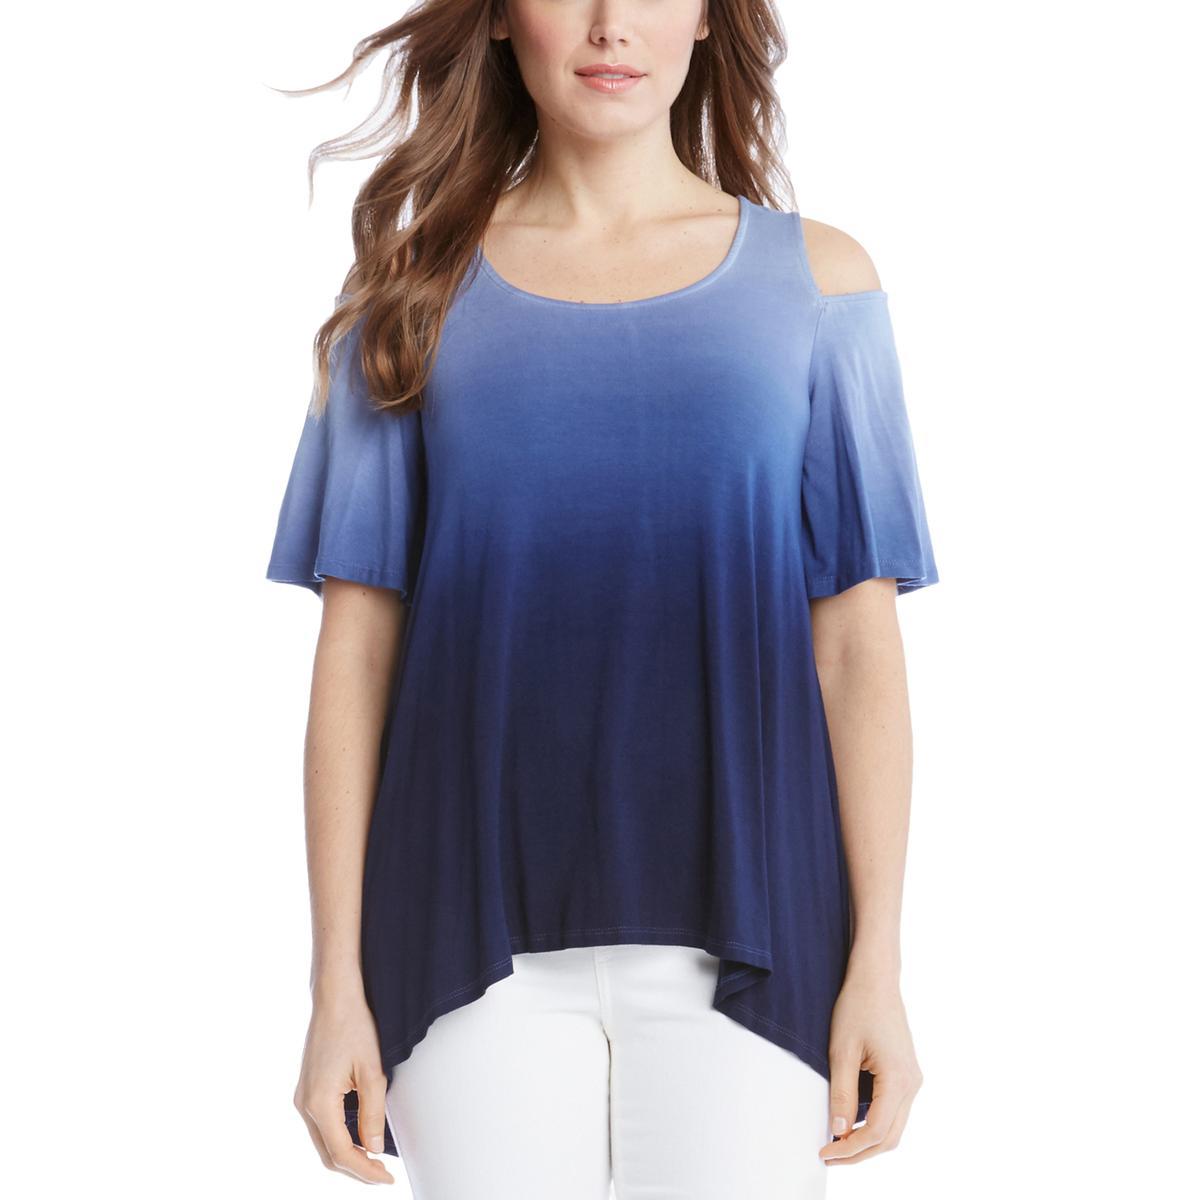 19dddcf3870 Details about Karen Kane Womens Blue Tie-Dye Ombre Cold Shoulder Tunic Top  Shirt M BHFO 7736